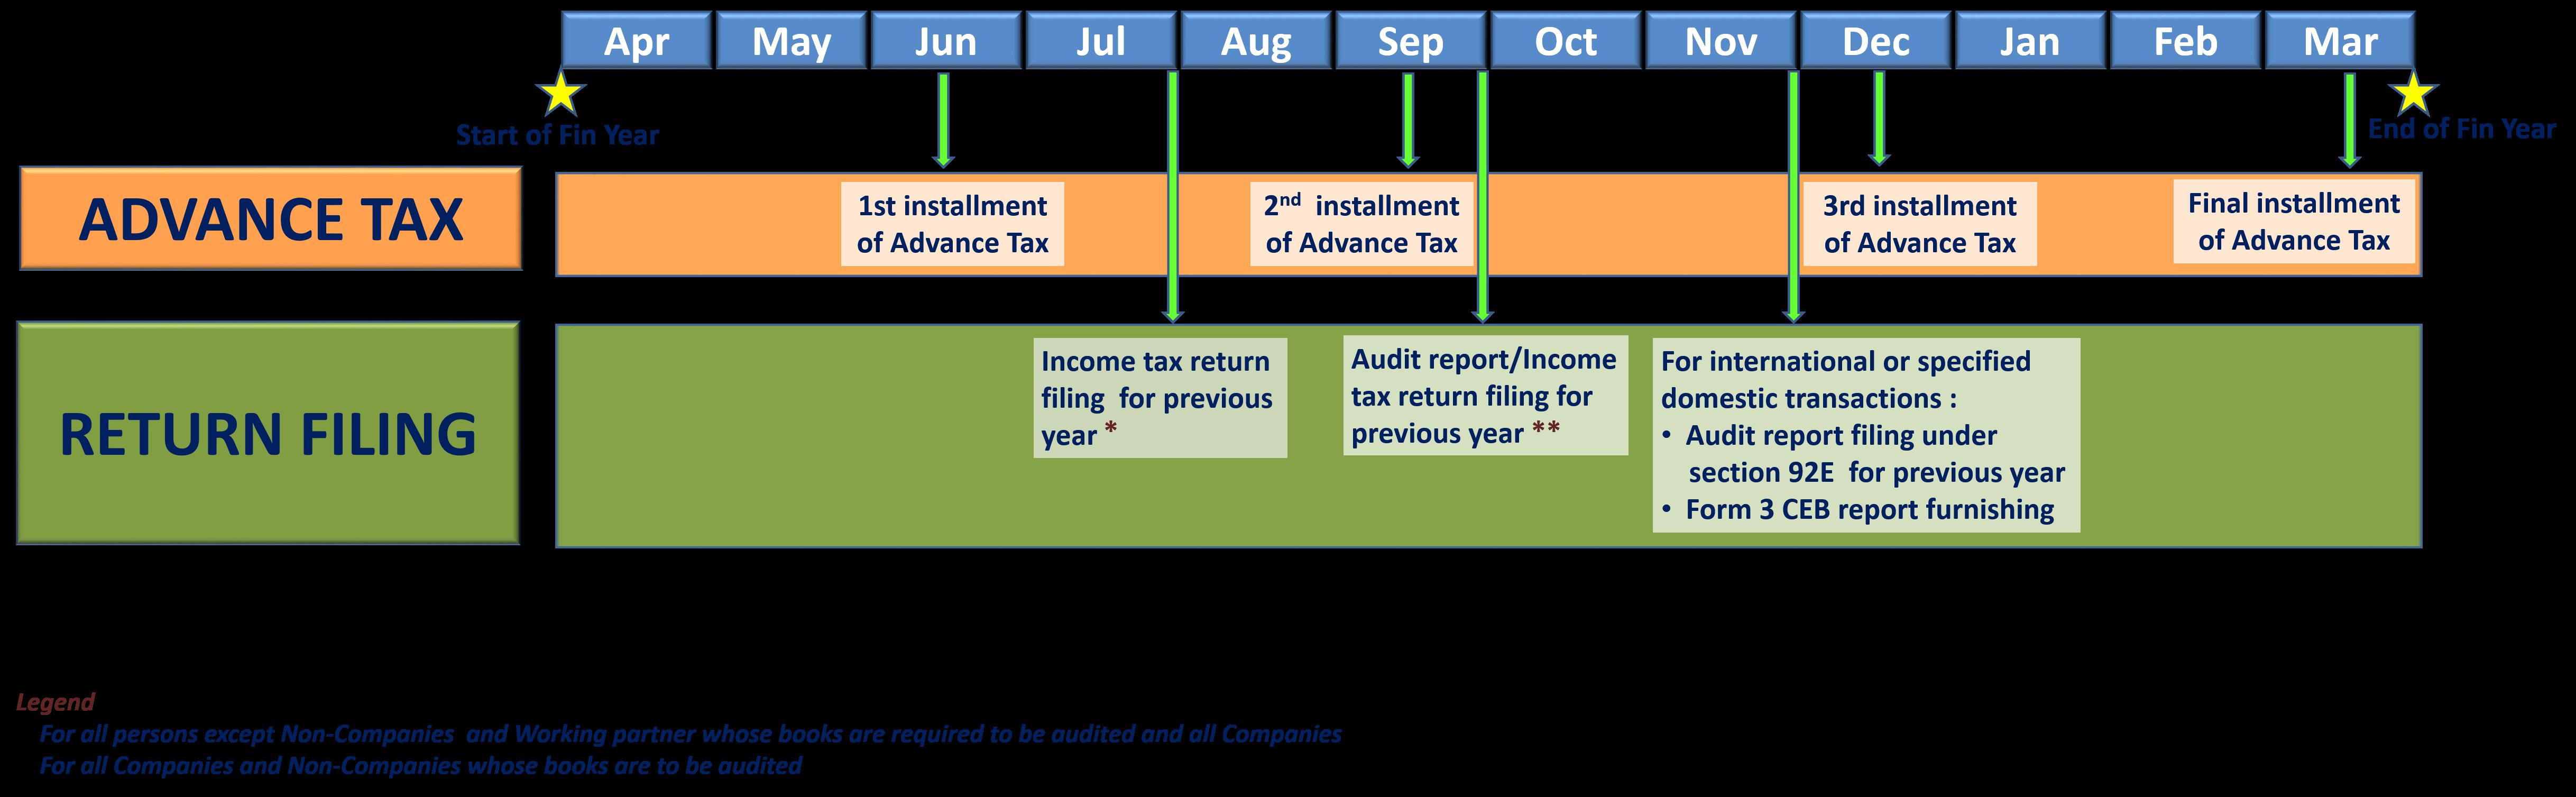 Income-Tax-Calendar